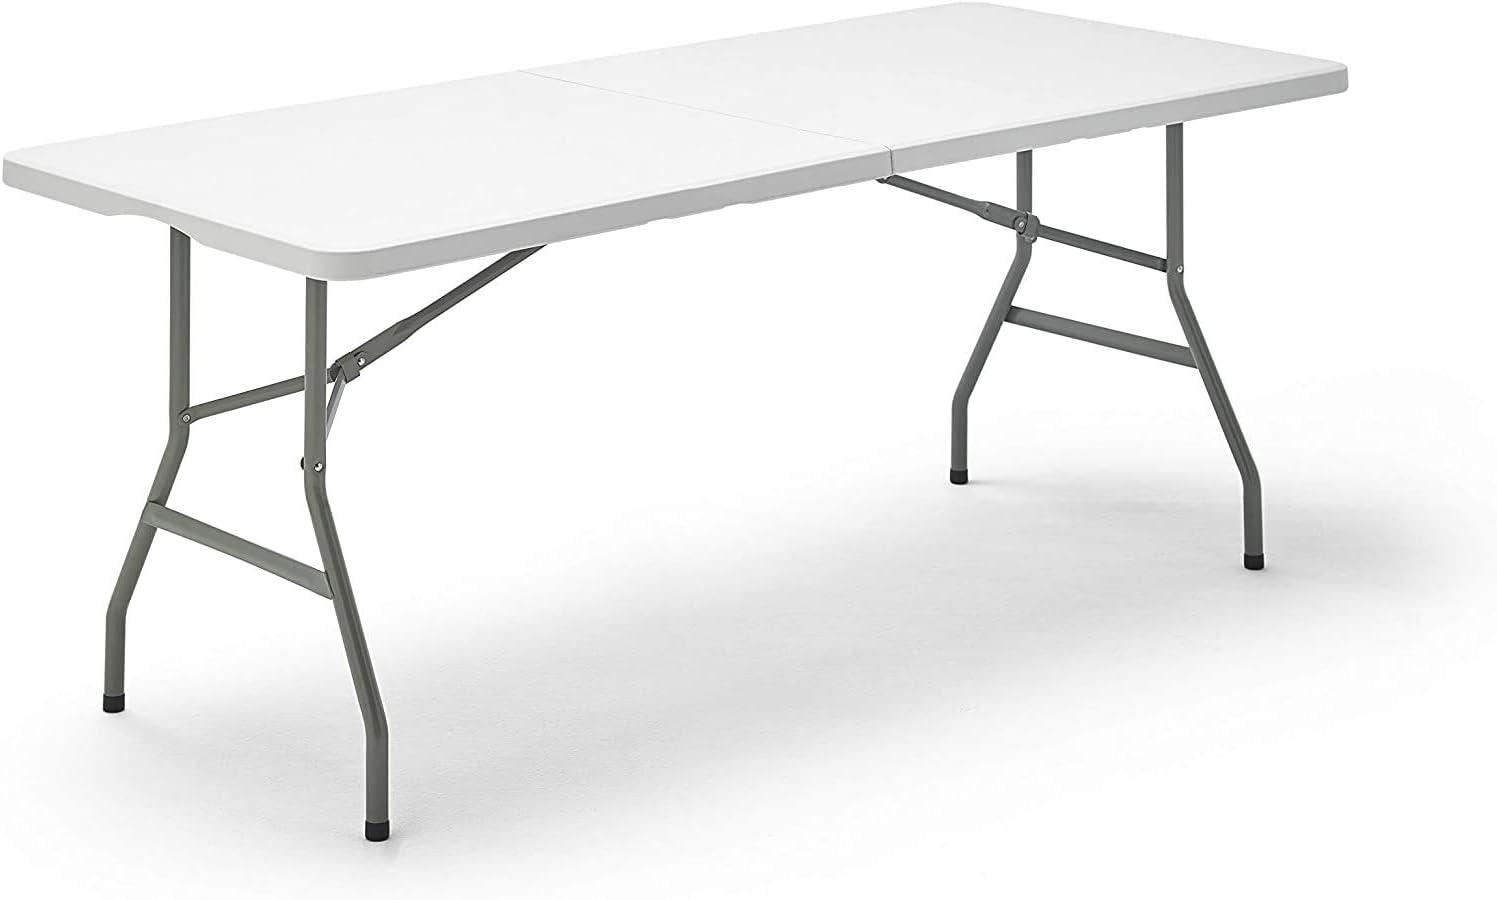 Tenco TG180 - Table Pliante Transportable